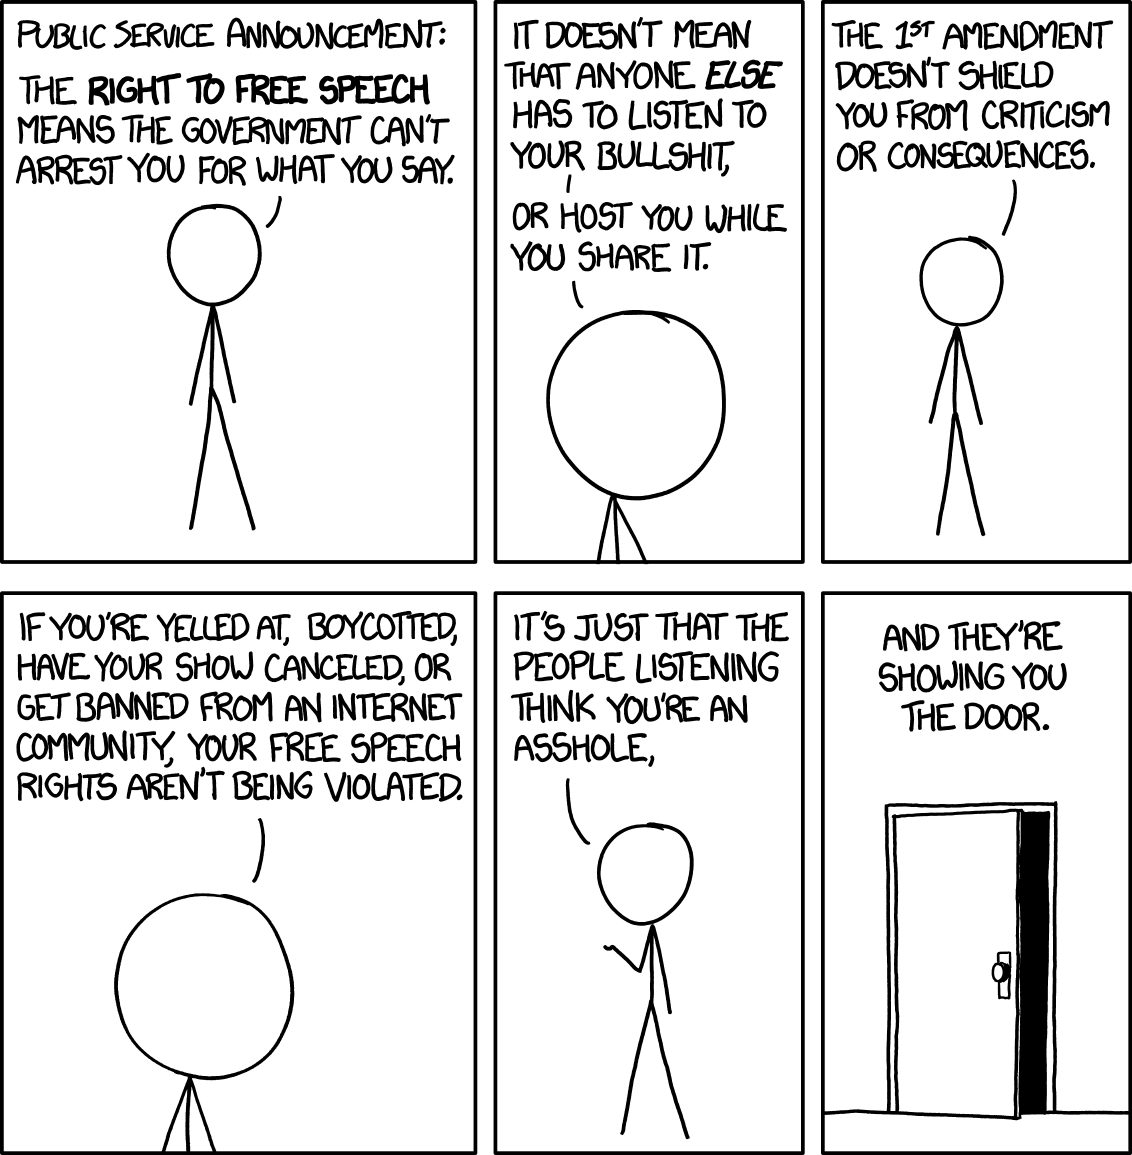 xkcd_1357_free_speech_2x